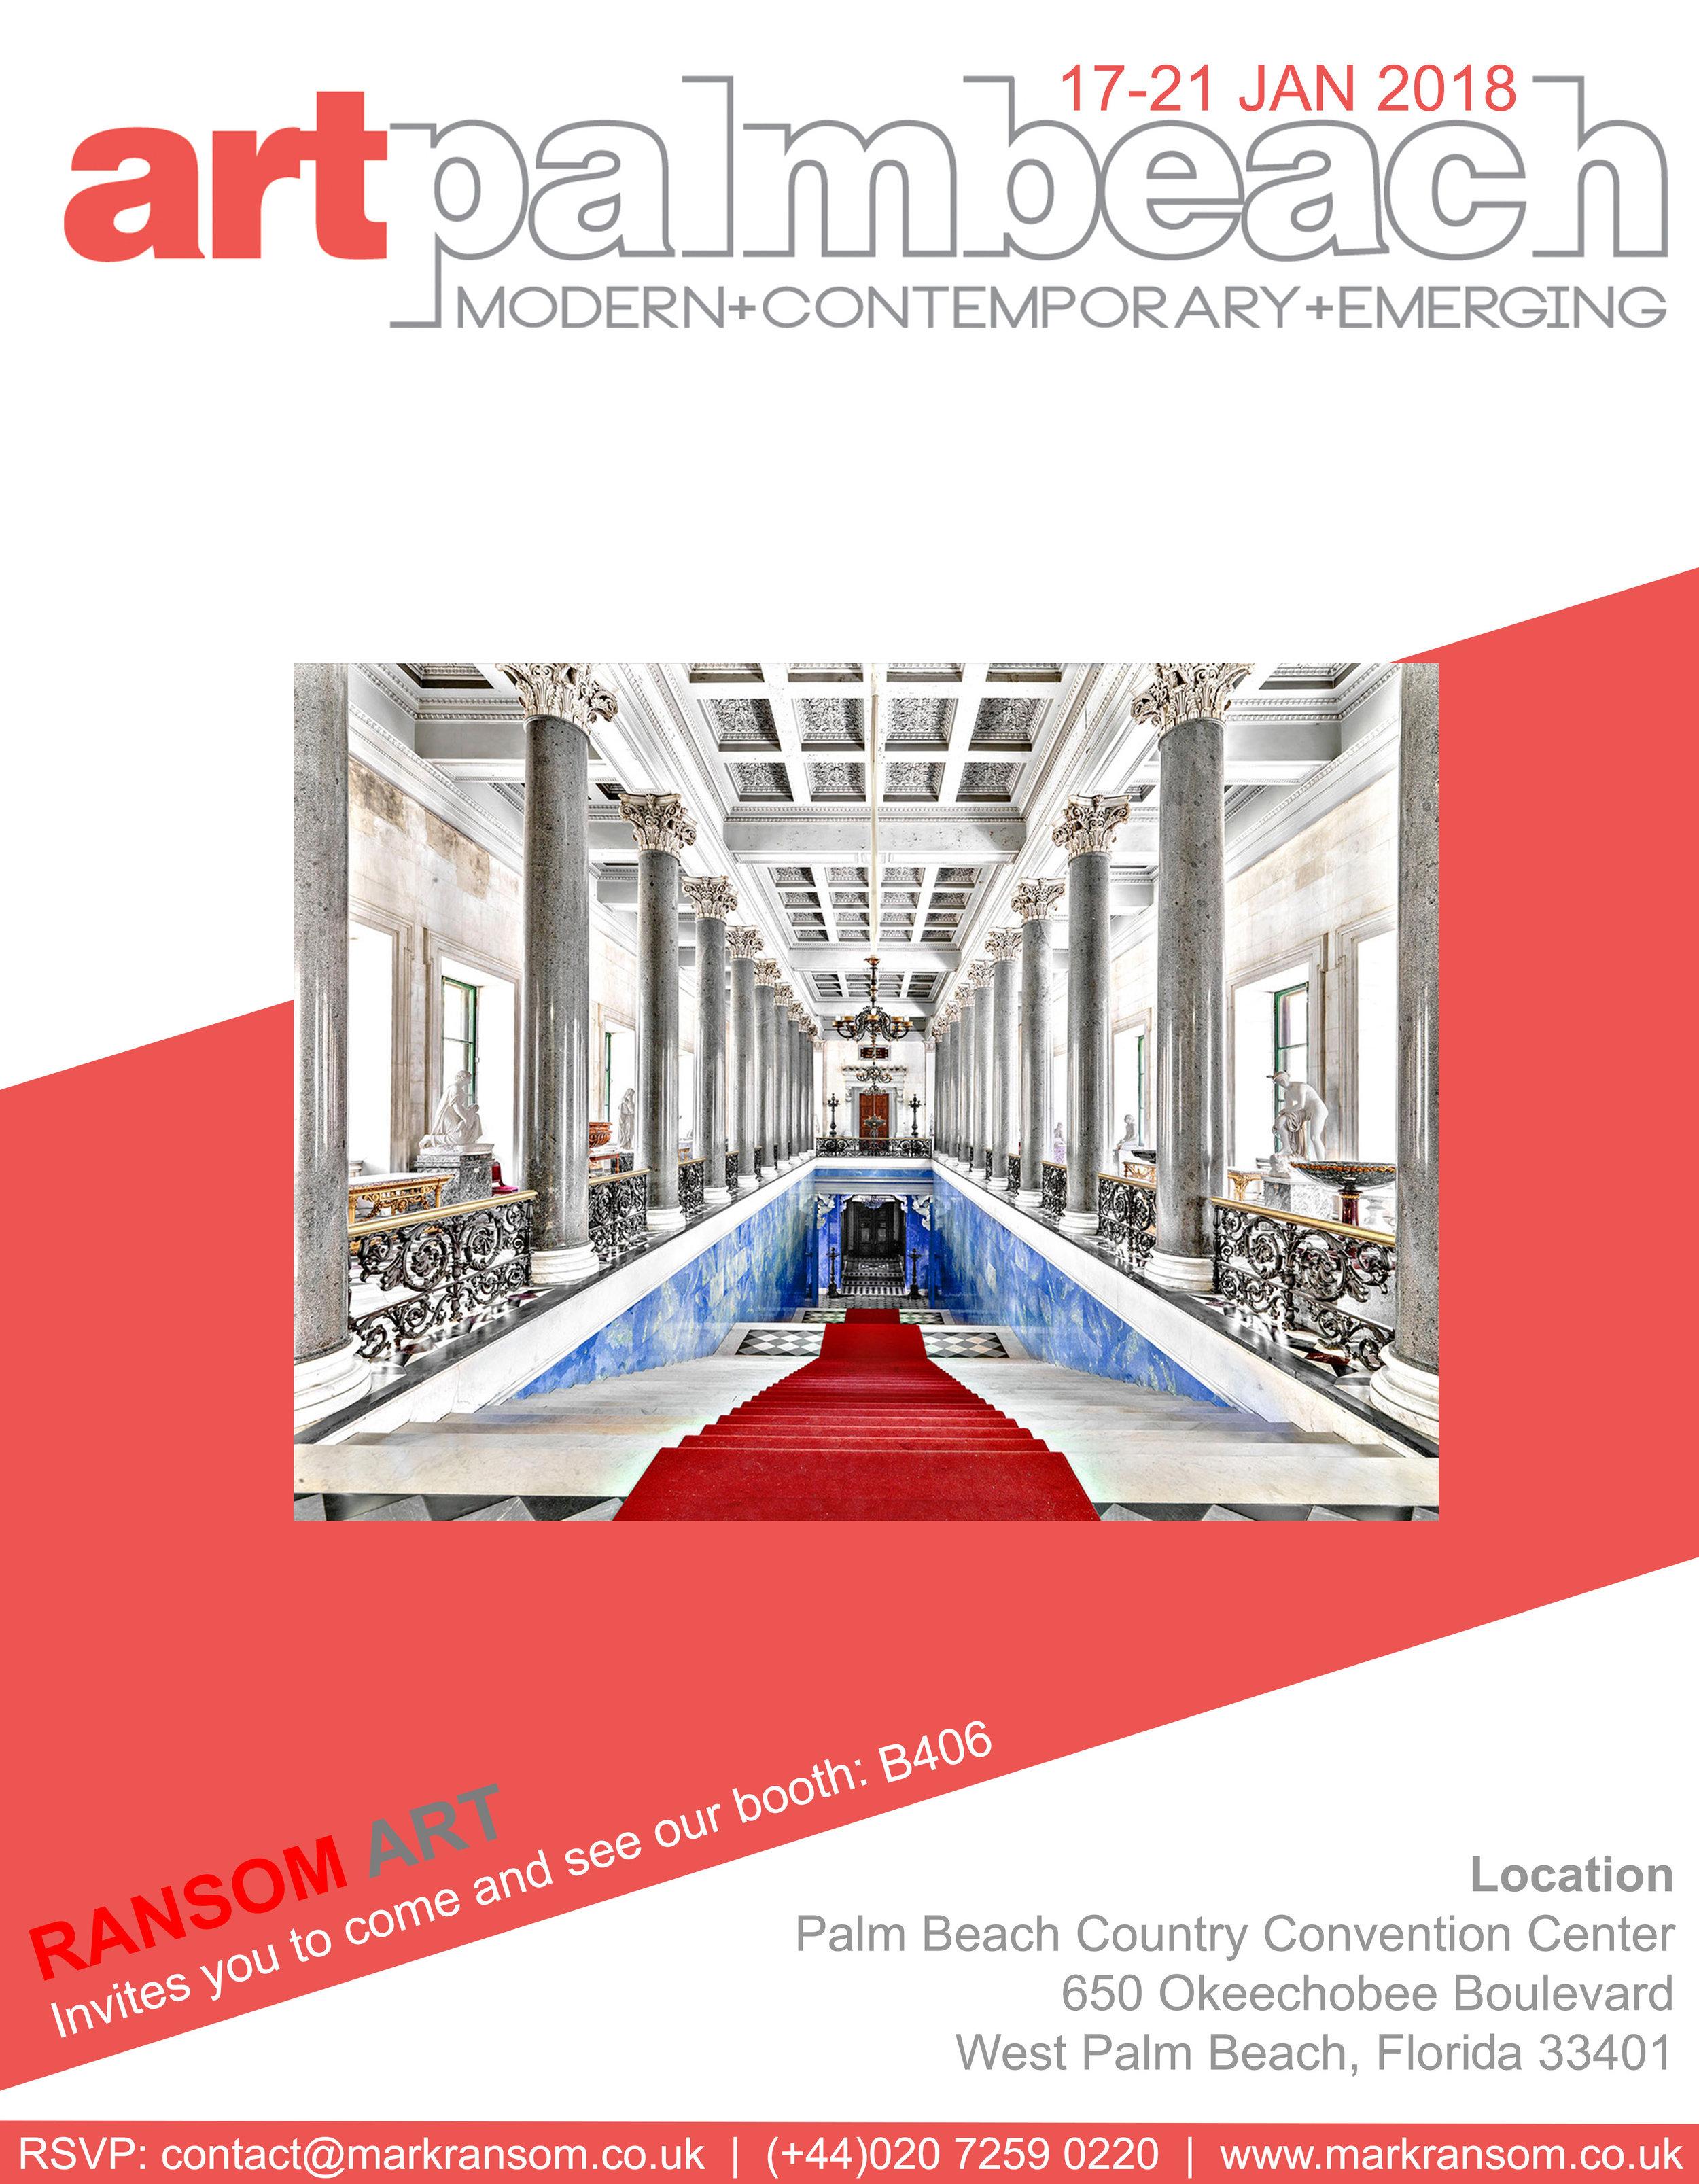 INVITATION - ART PALM BEACH (Massimo Listri).jpg